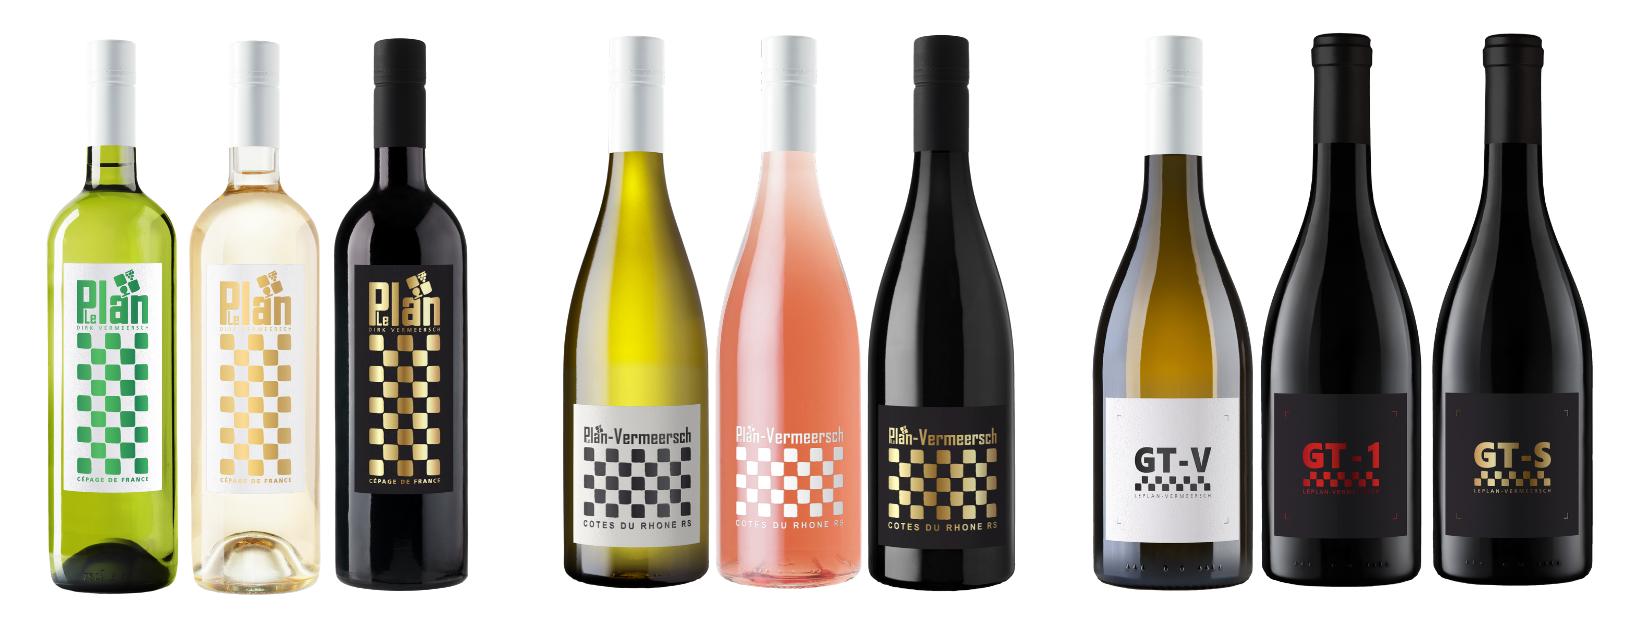 range leplan wines